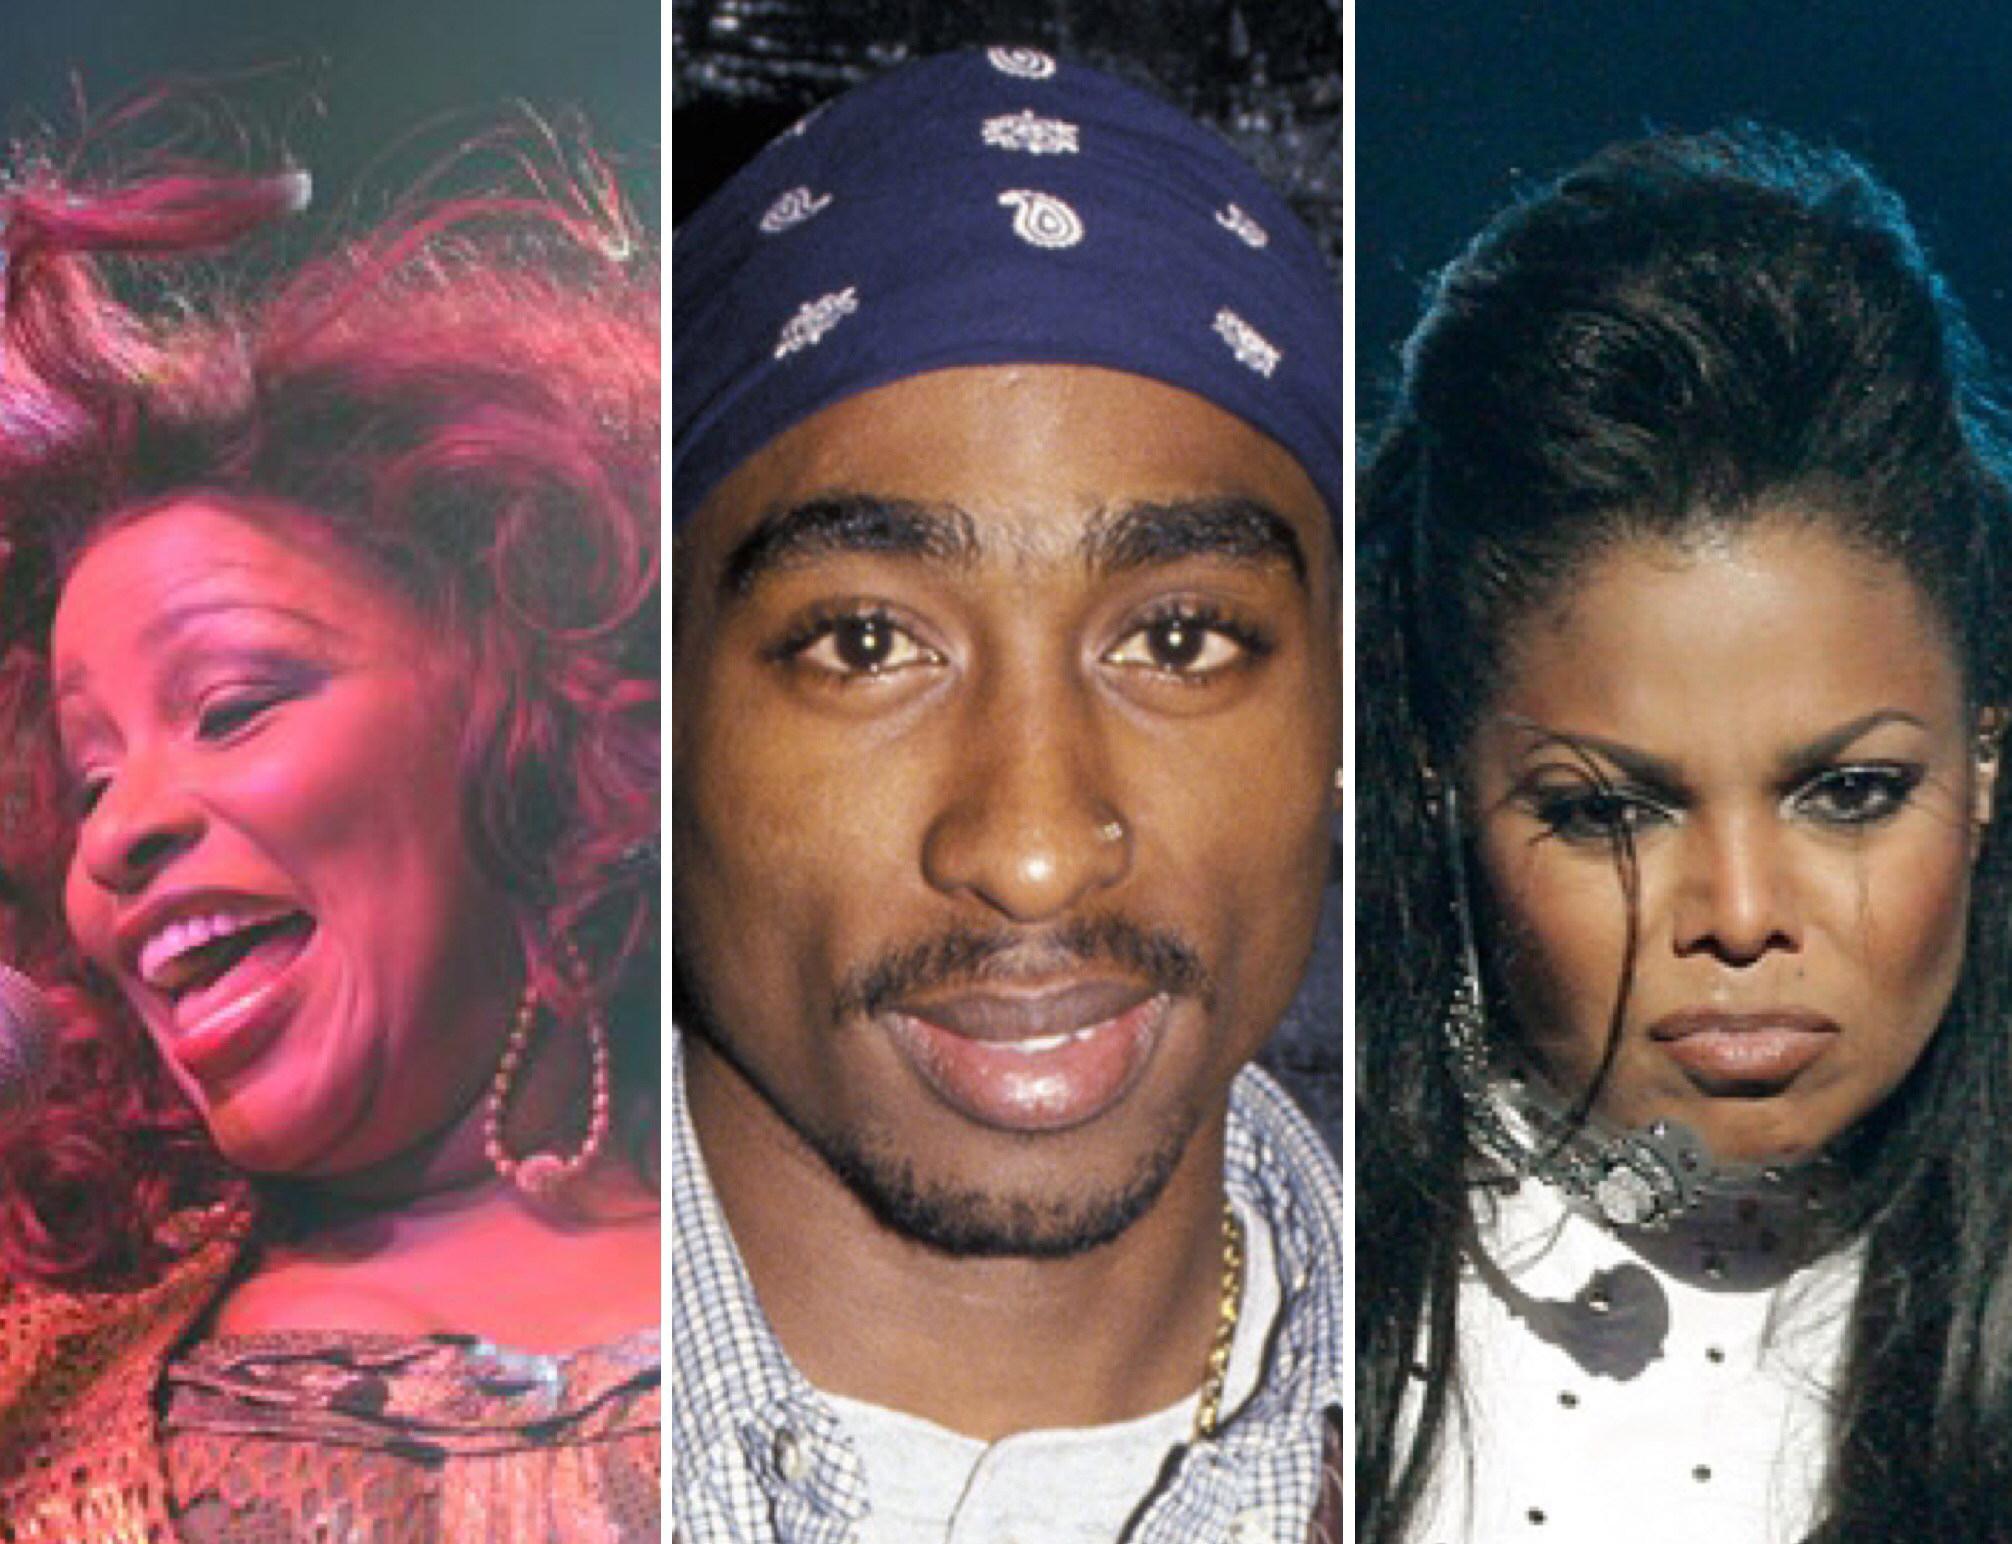 Chaka Khan, Janet Jackson, Tupac Shakur and Chic Among 2017 Rock & Roll Hall of Fame Nominees